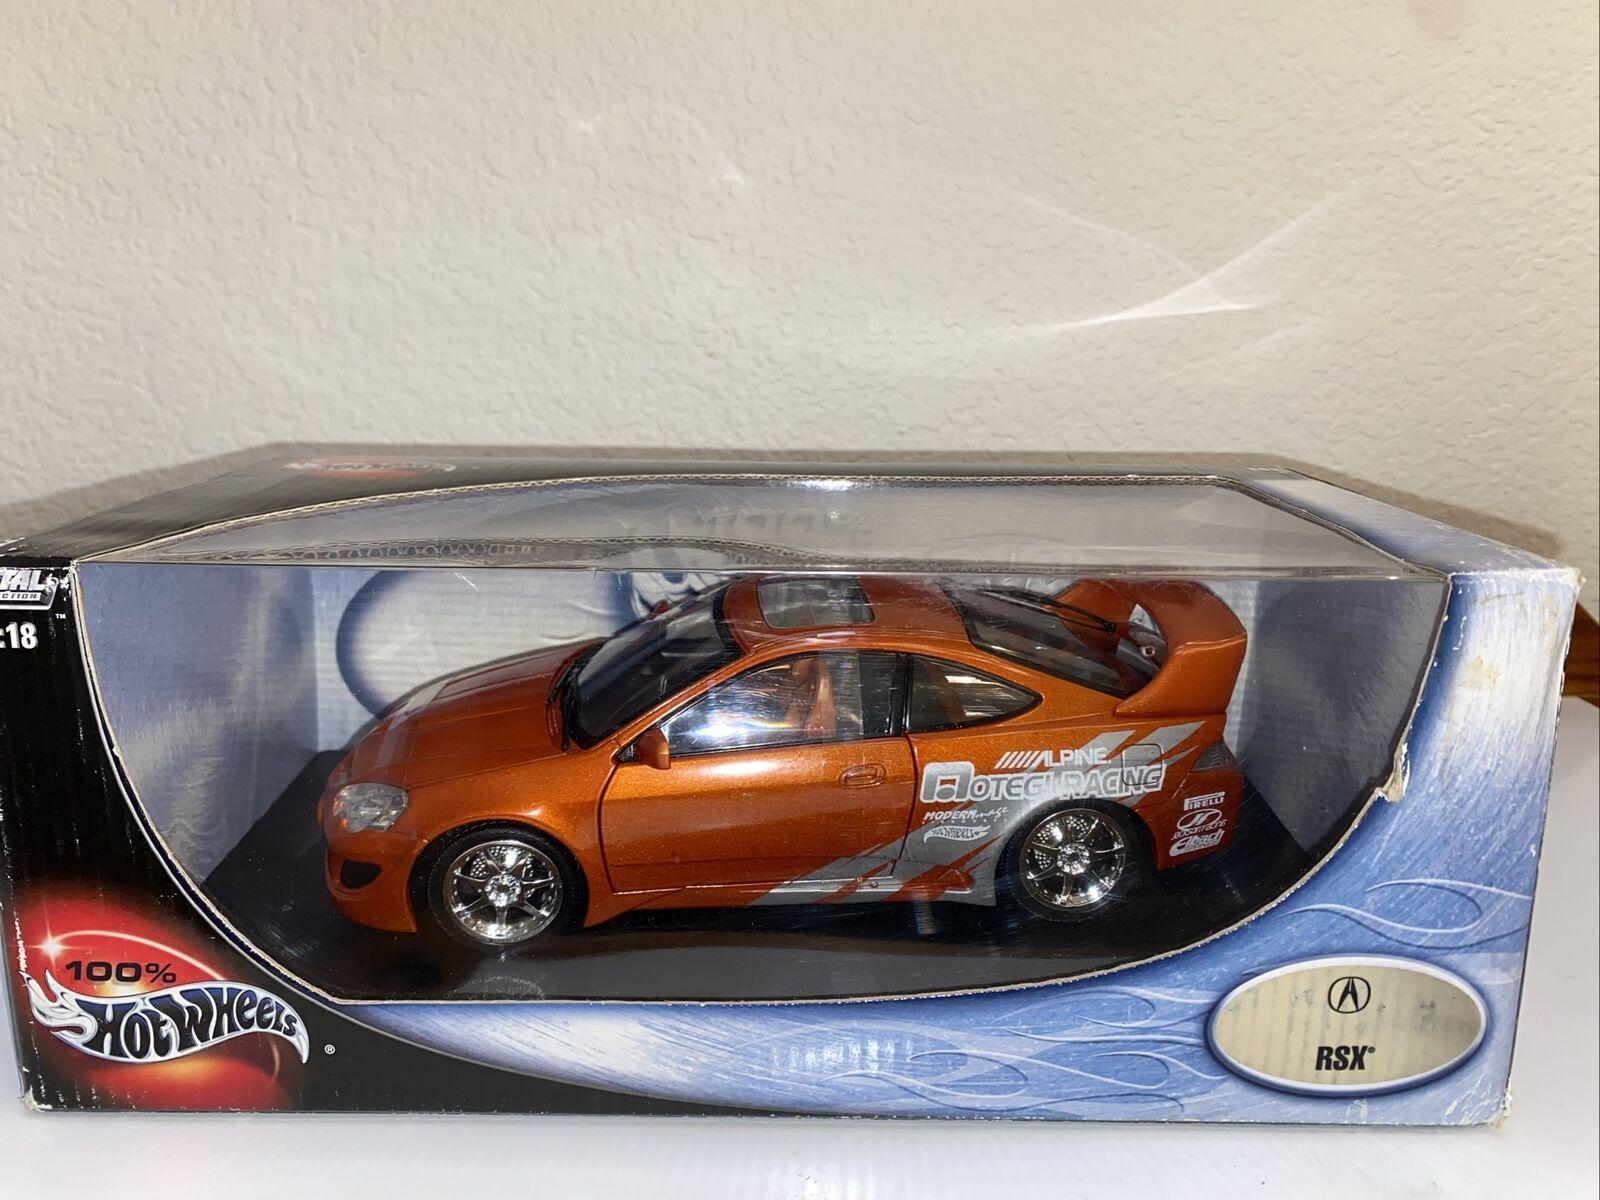 Hot Wheels 1 18 Blue Honda Acura Rsx Die Cast Metal Xxl Tuners Mp3 Super Street For Sale Online Ebay